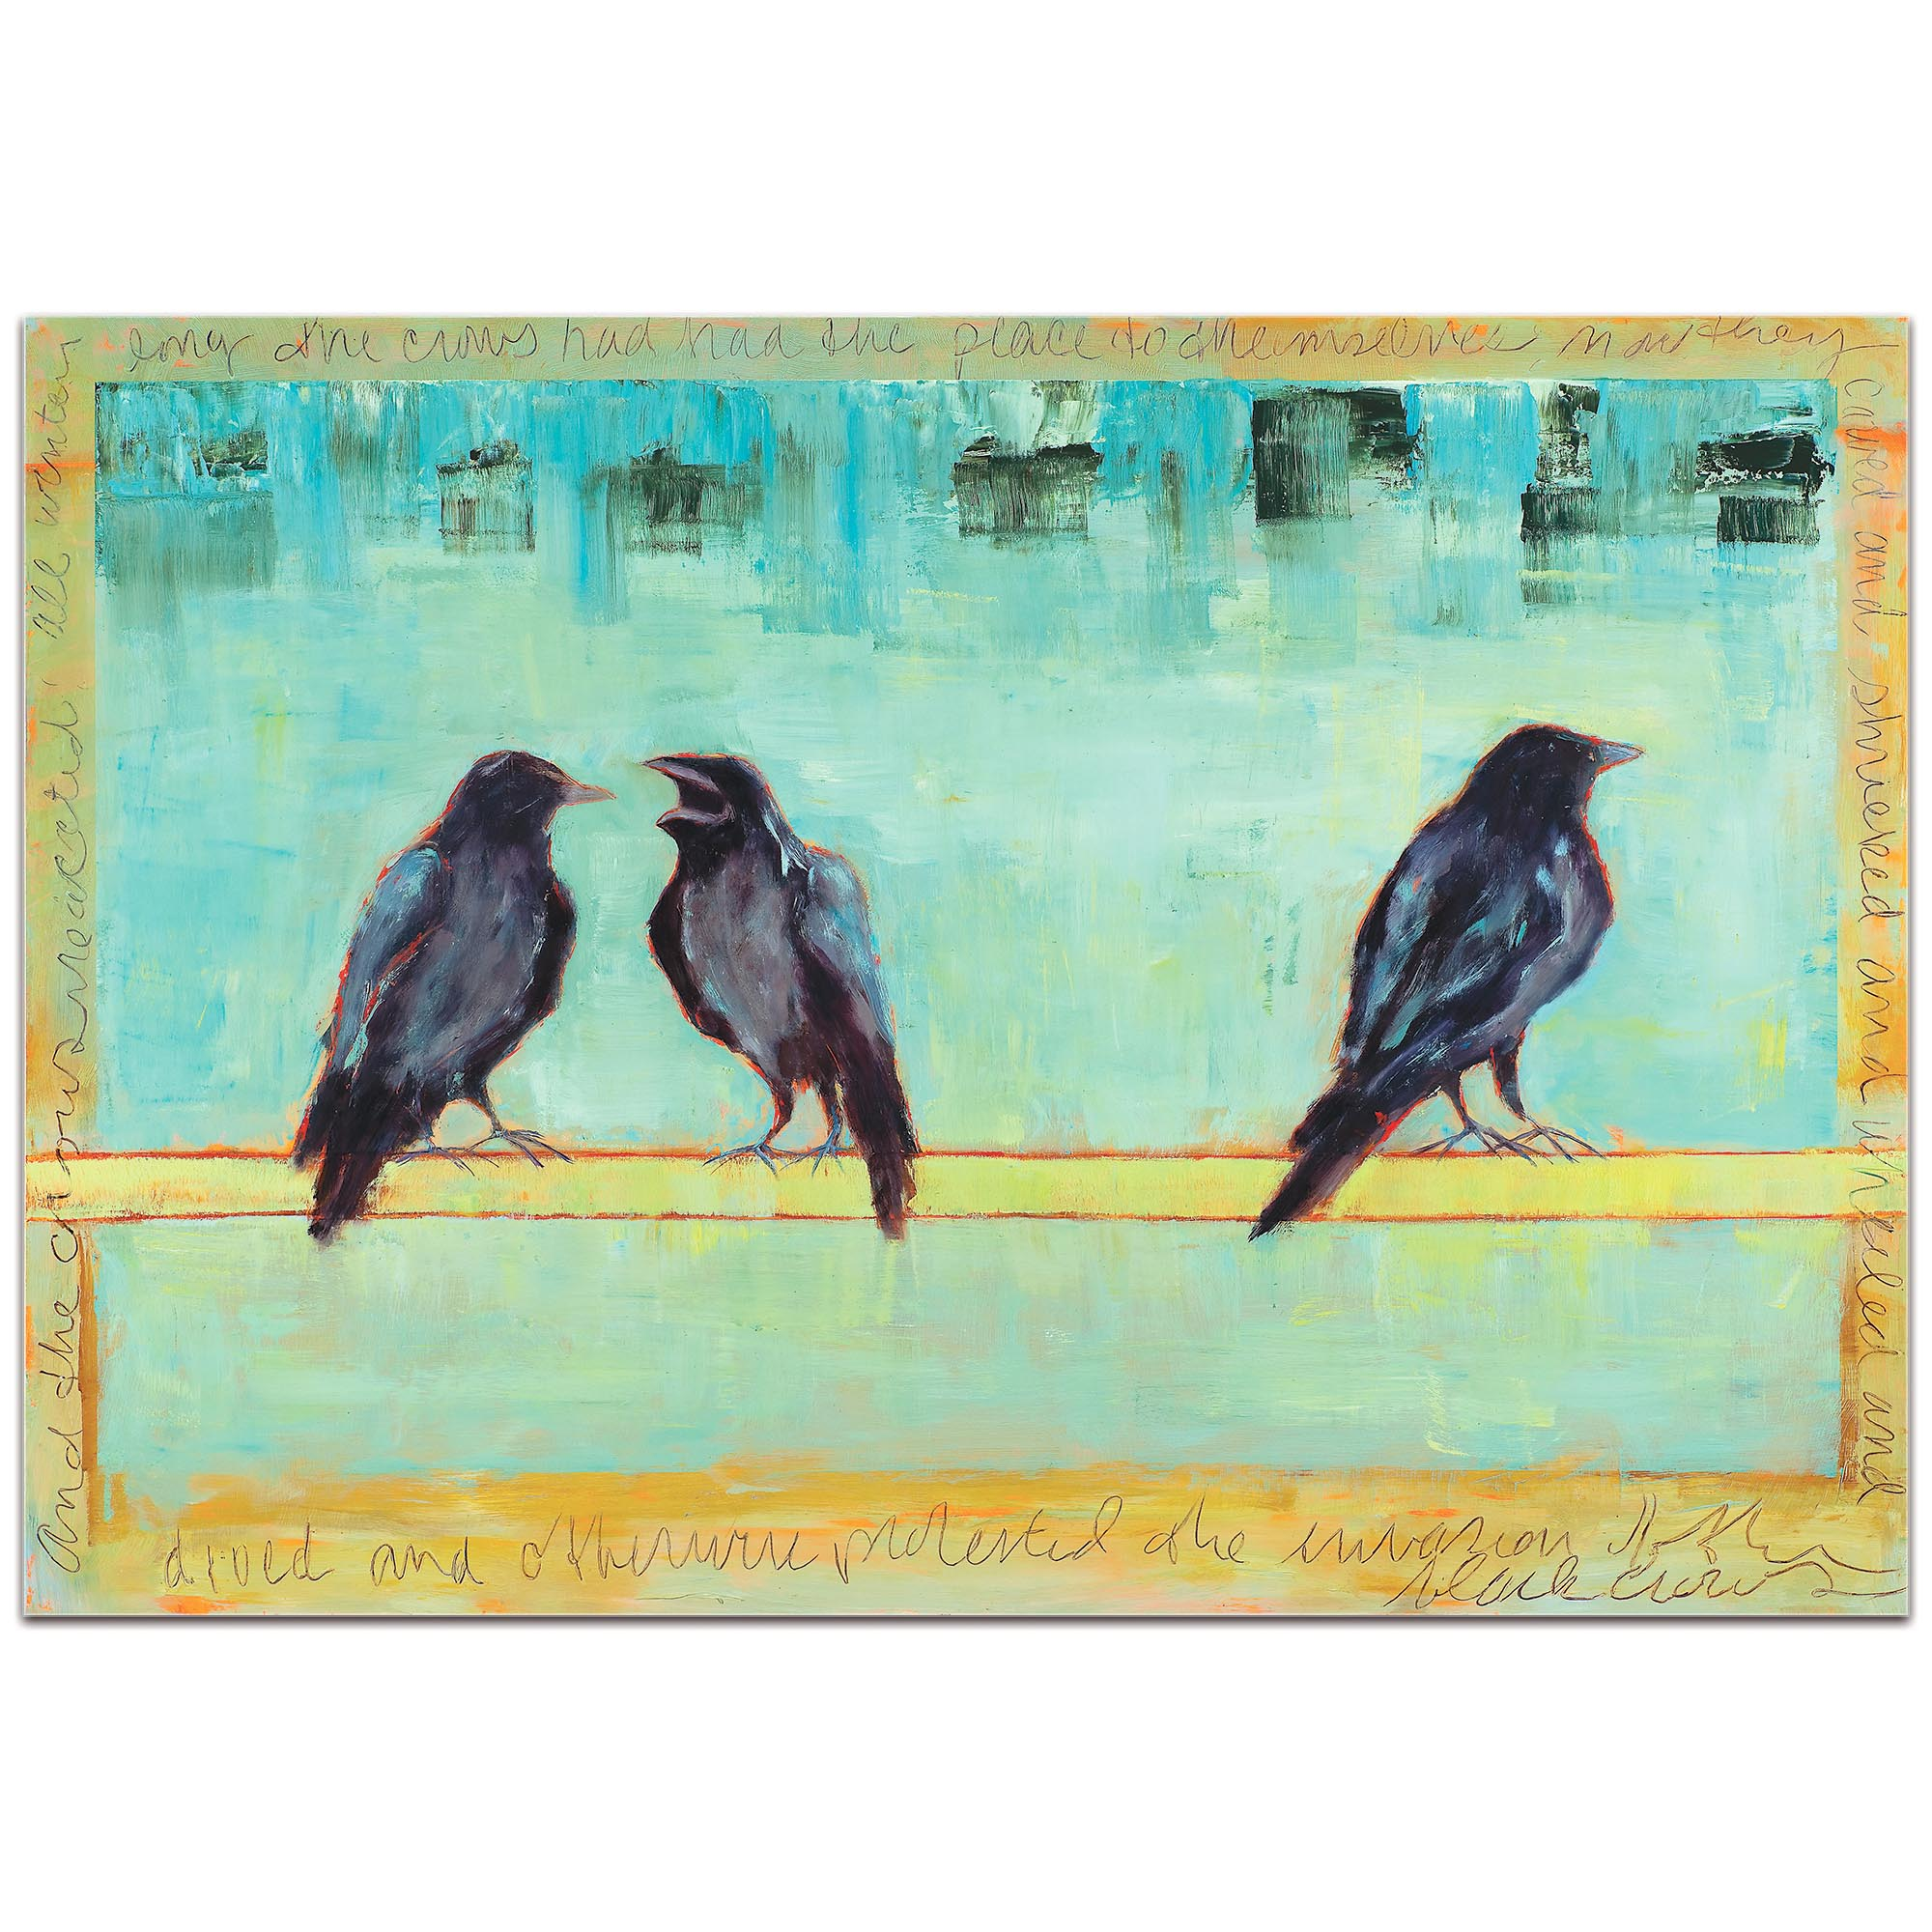 Contemporary Wall Art 'Crow Bar 2' - Urban Birds Decor on Metal or Plexiglass - Image 2